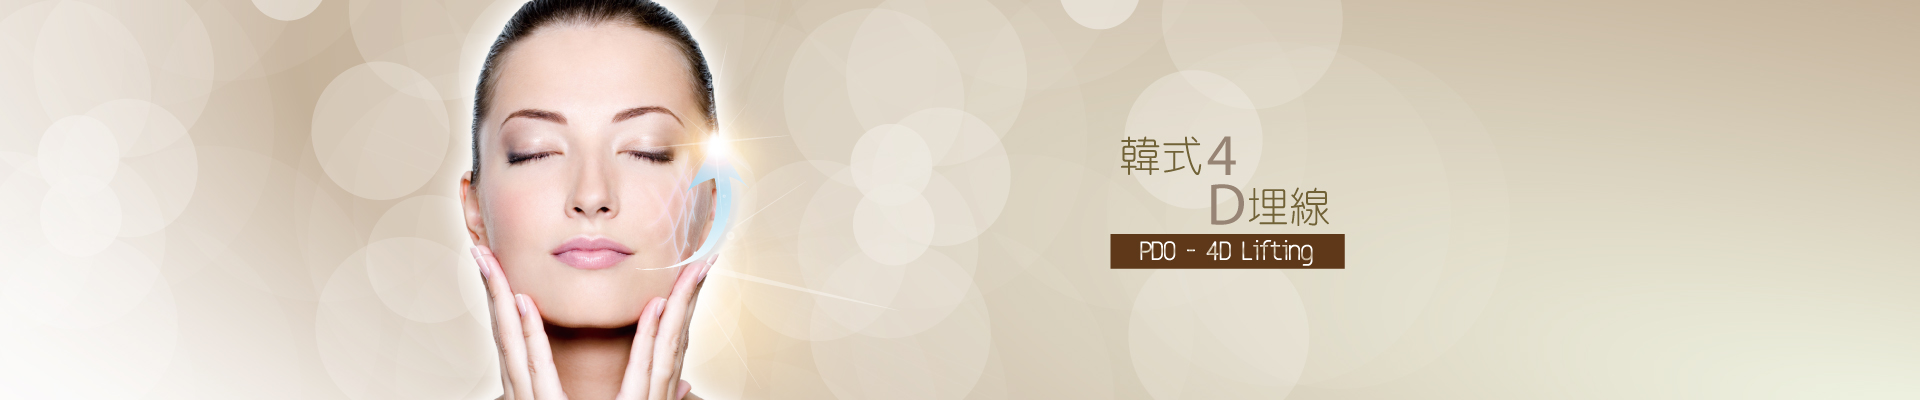 Dream Beauty Pro 韓式4D埋線 PDO - 4D Lifting